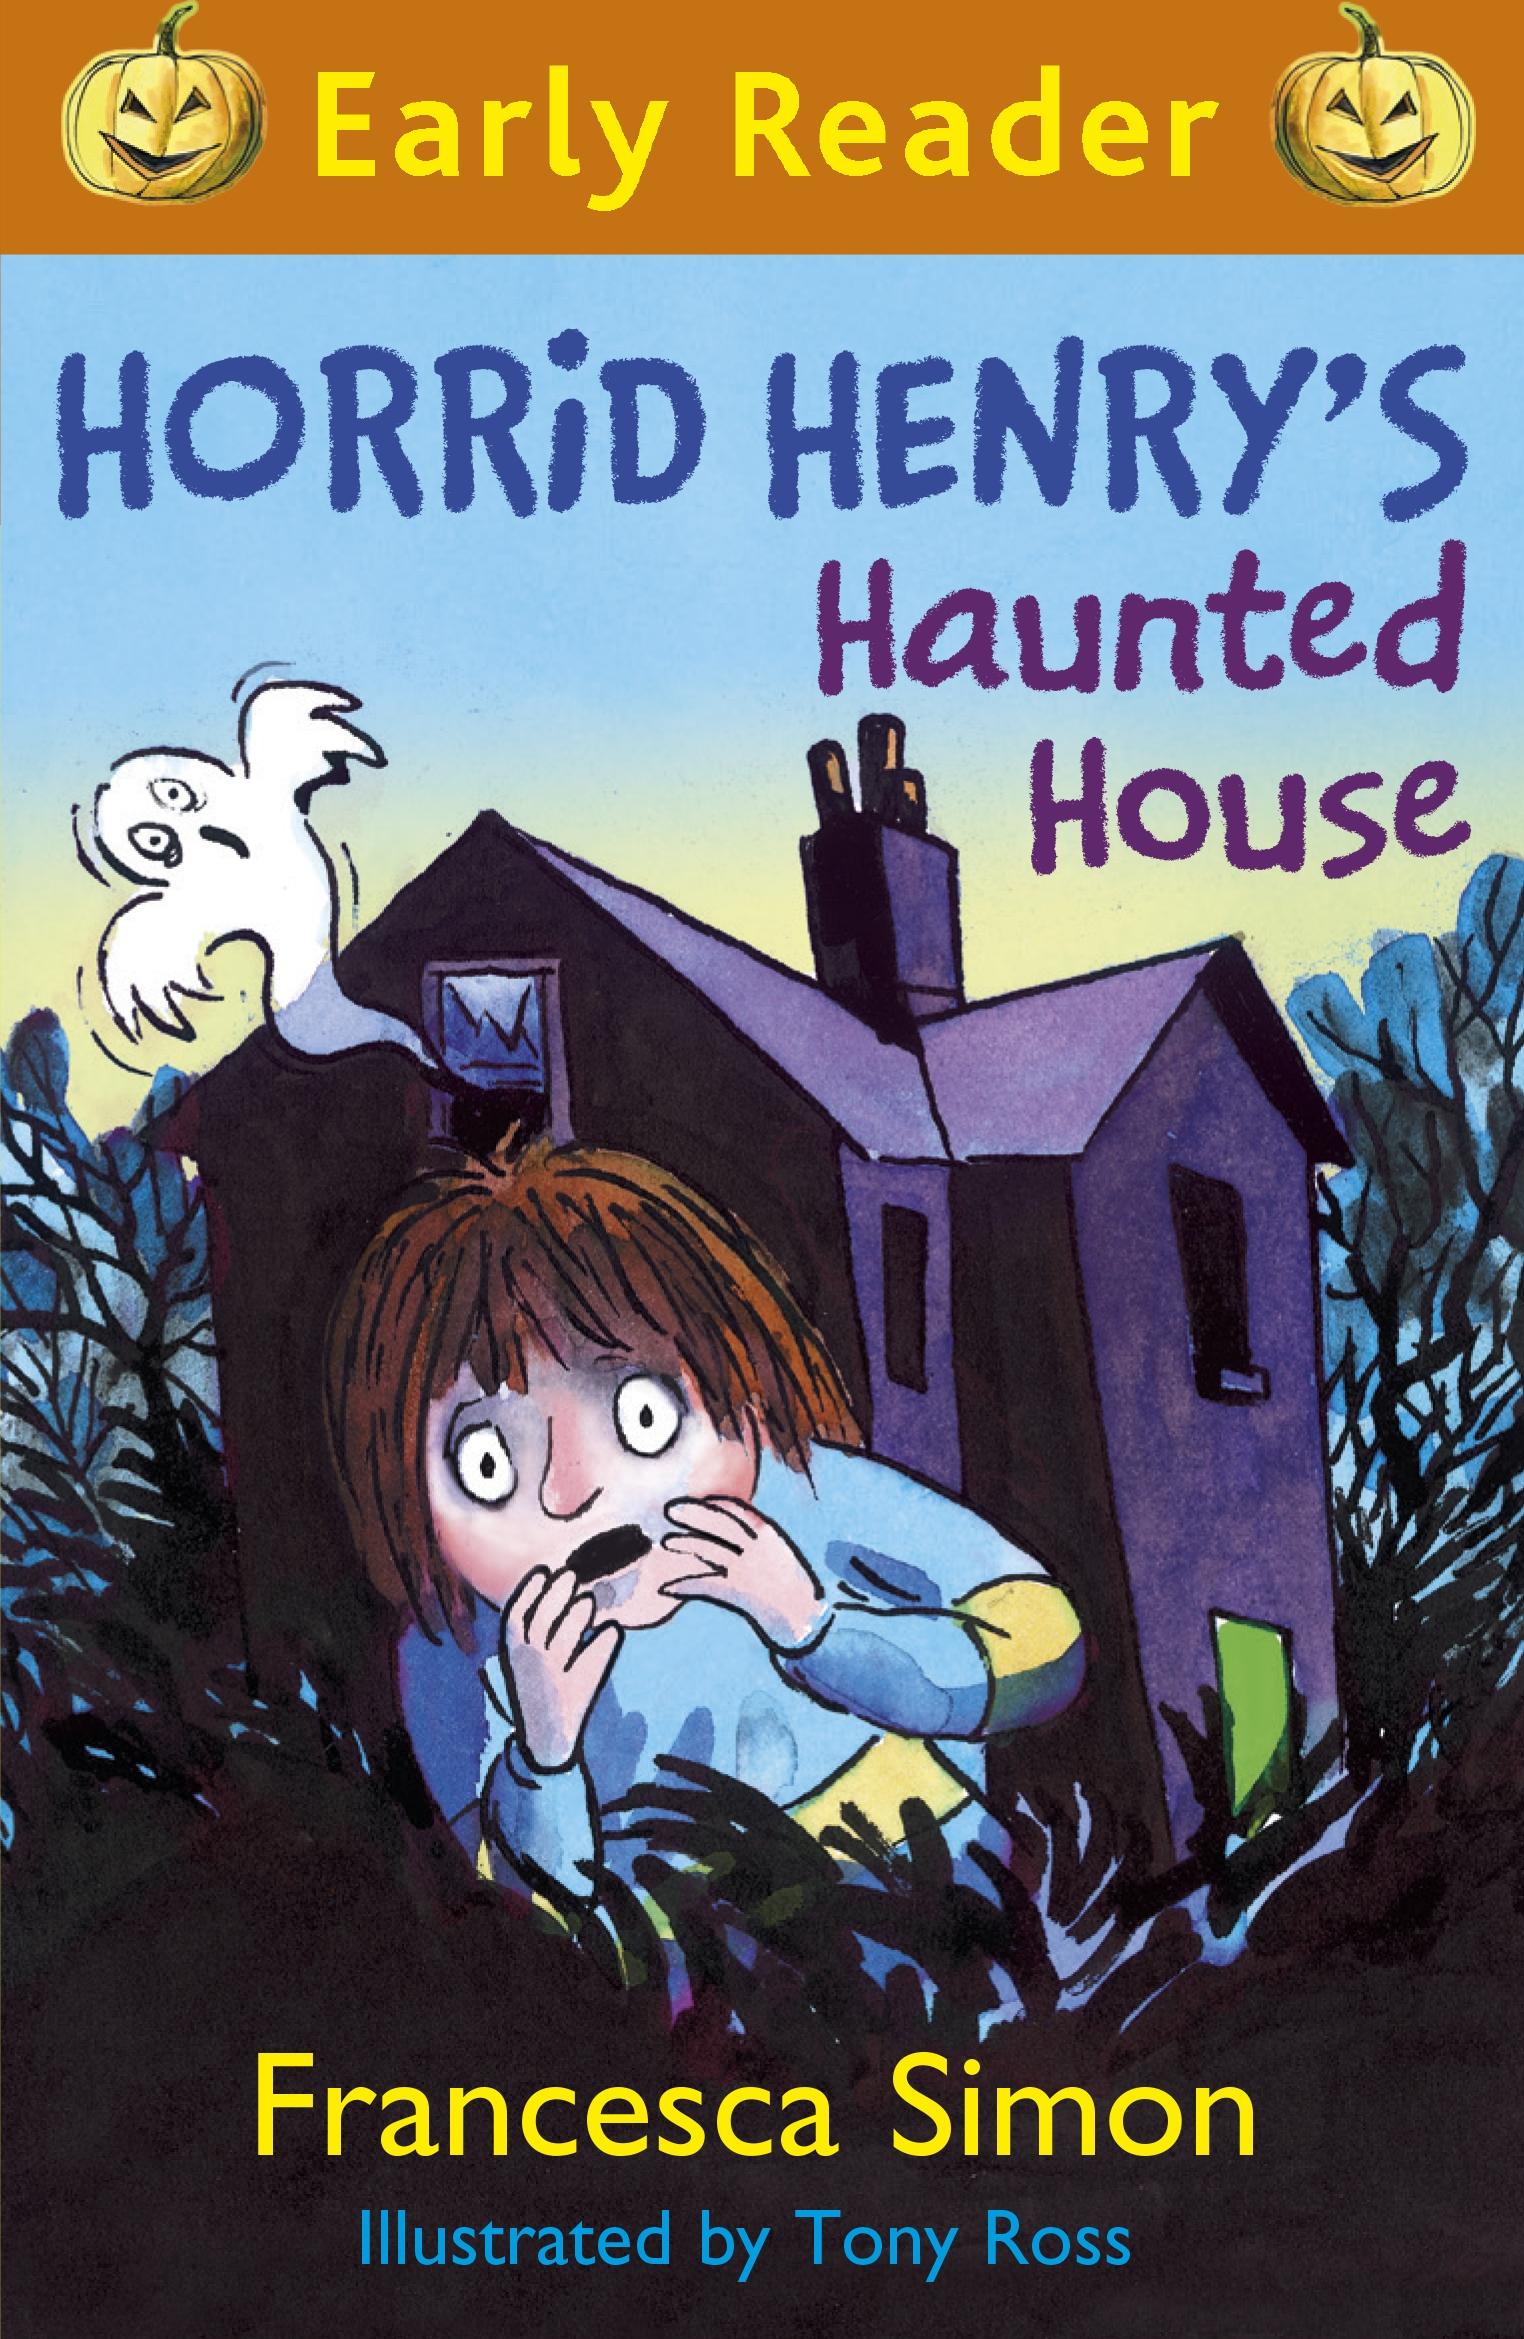 Horrid Henry's Tricks and Treats | Halloween Specials Wiki | Fandom